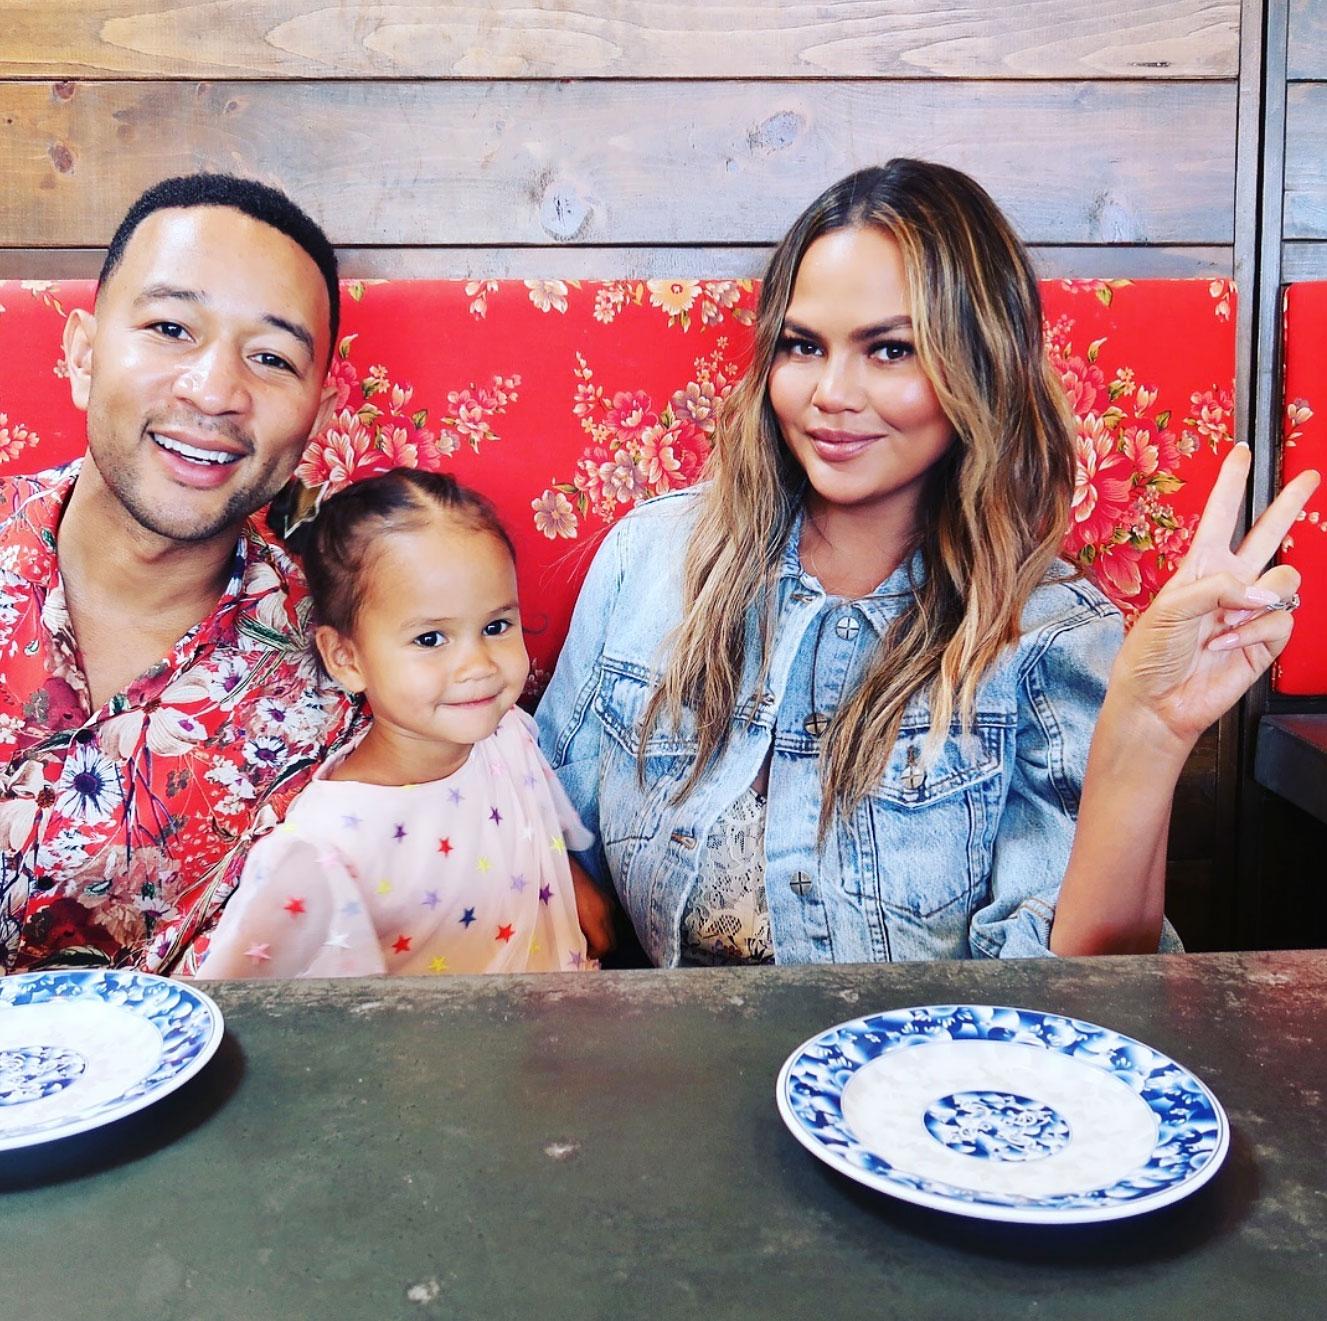 Chrissy Teigen and John Legend Daughter Luna Has Her 1st Crush